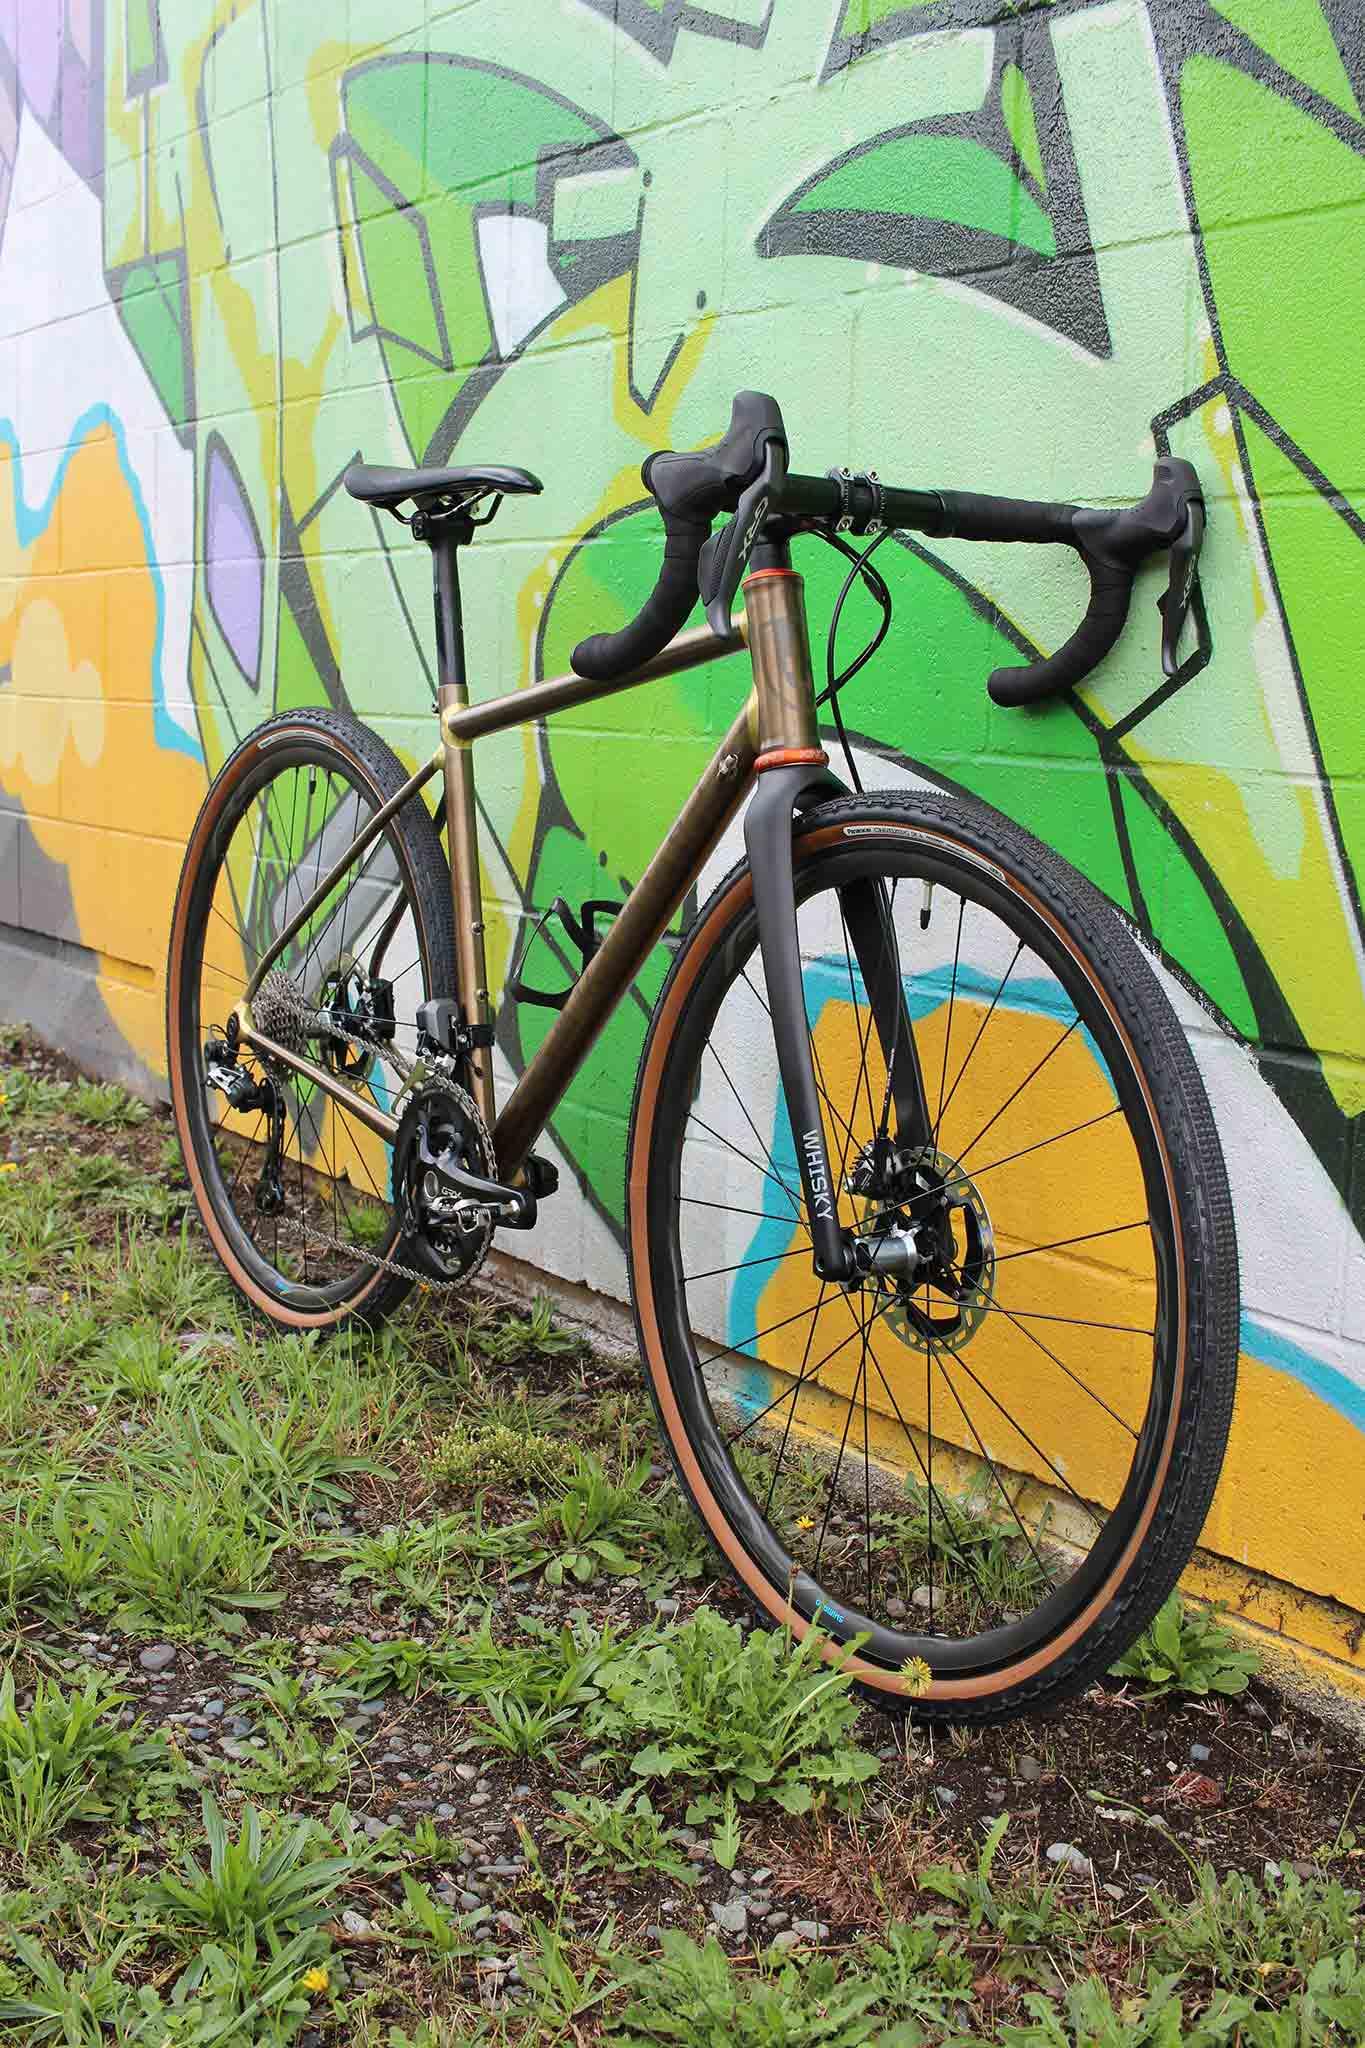 doug-custom-landyachtz-bike-IMG_7083-Copy